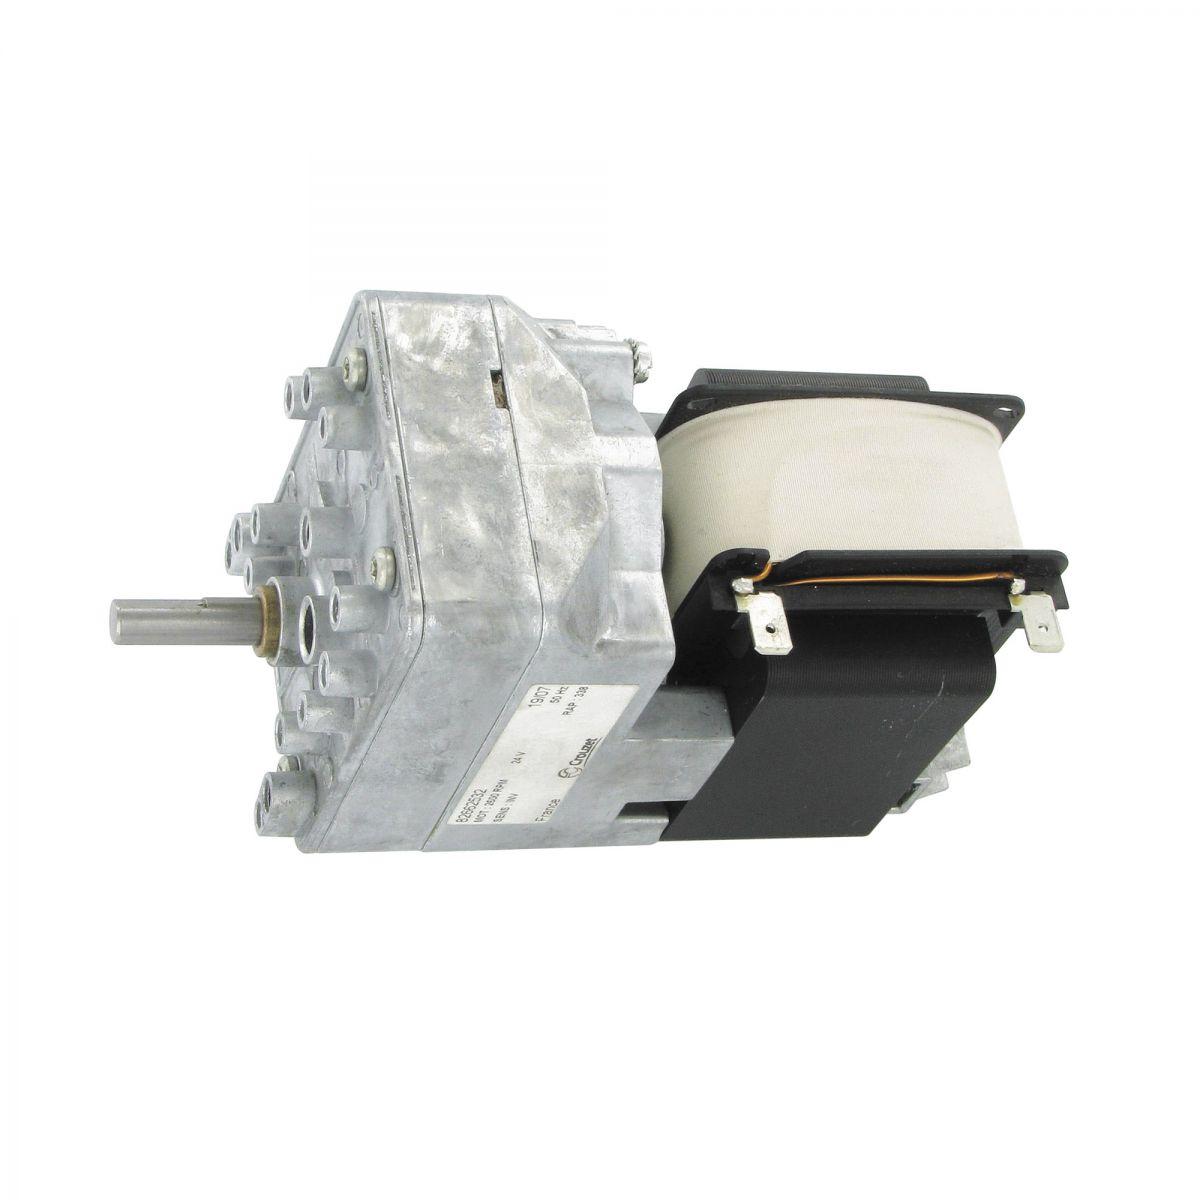 motor 24v ac50hz nom 8rpm links crouzet nr 82662532 passend op fullwood